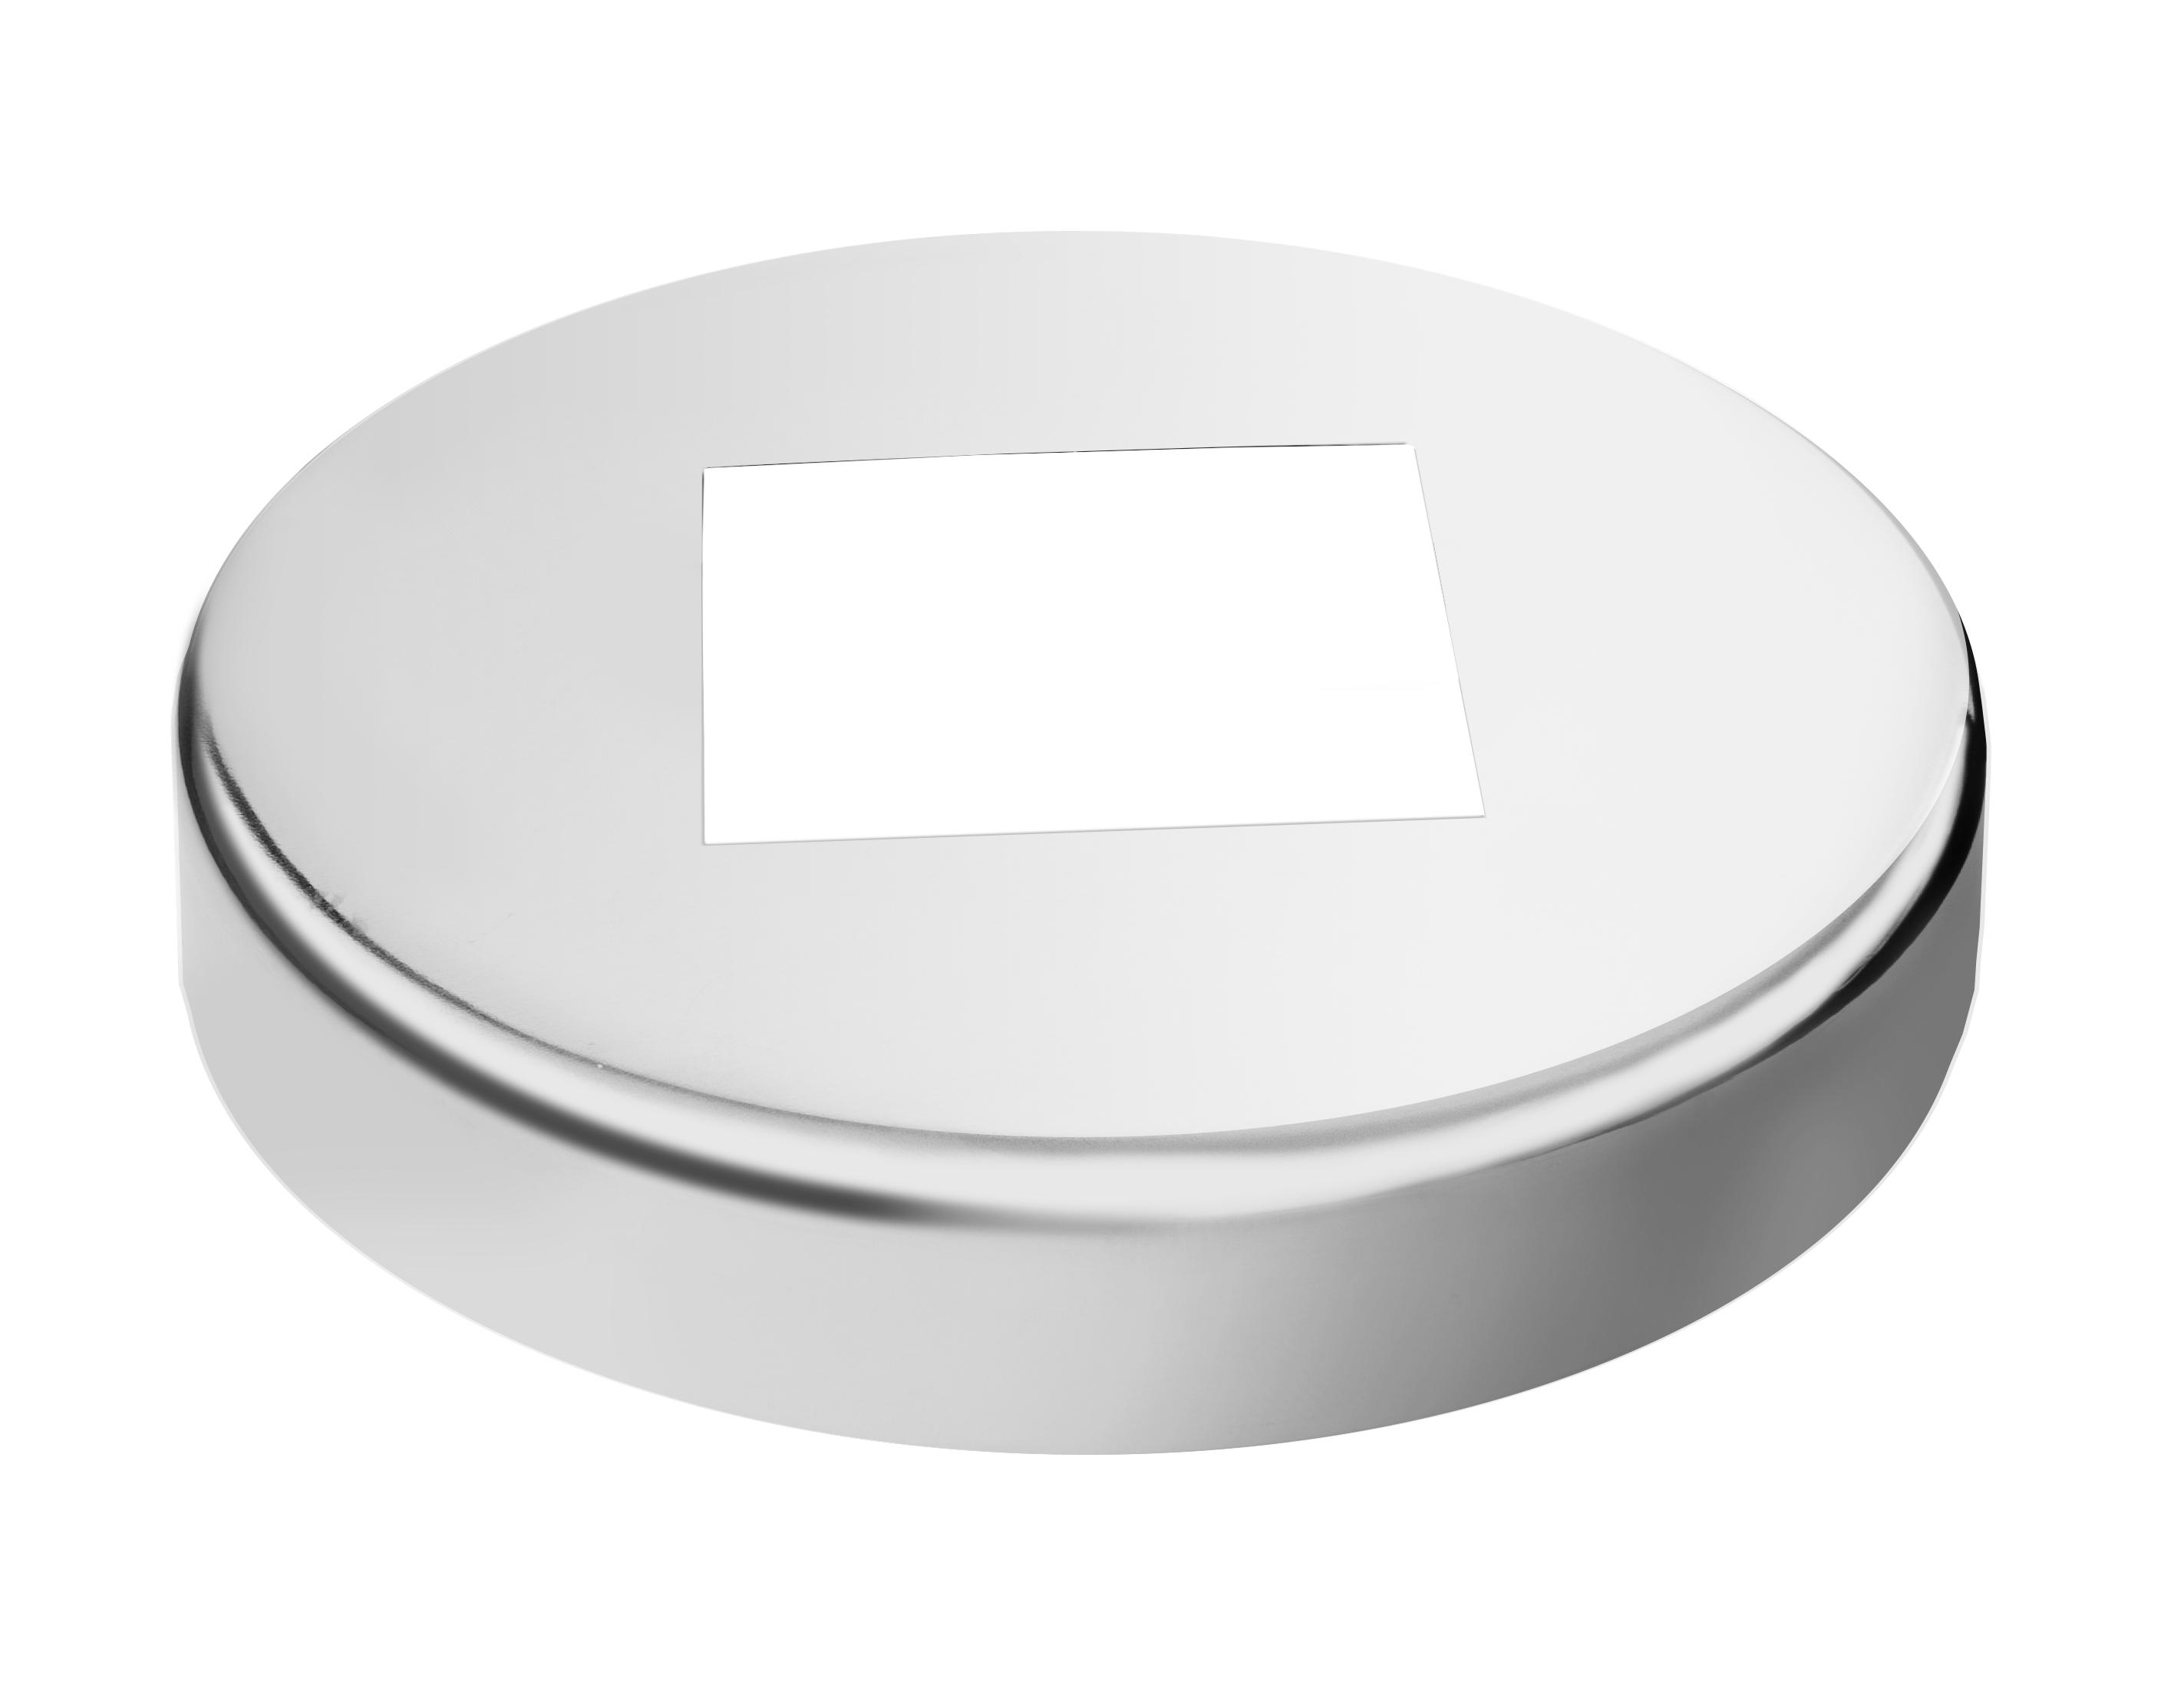 Embellecedor cilíndrico para tubo cuadrado